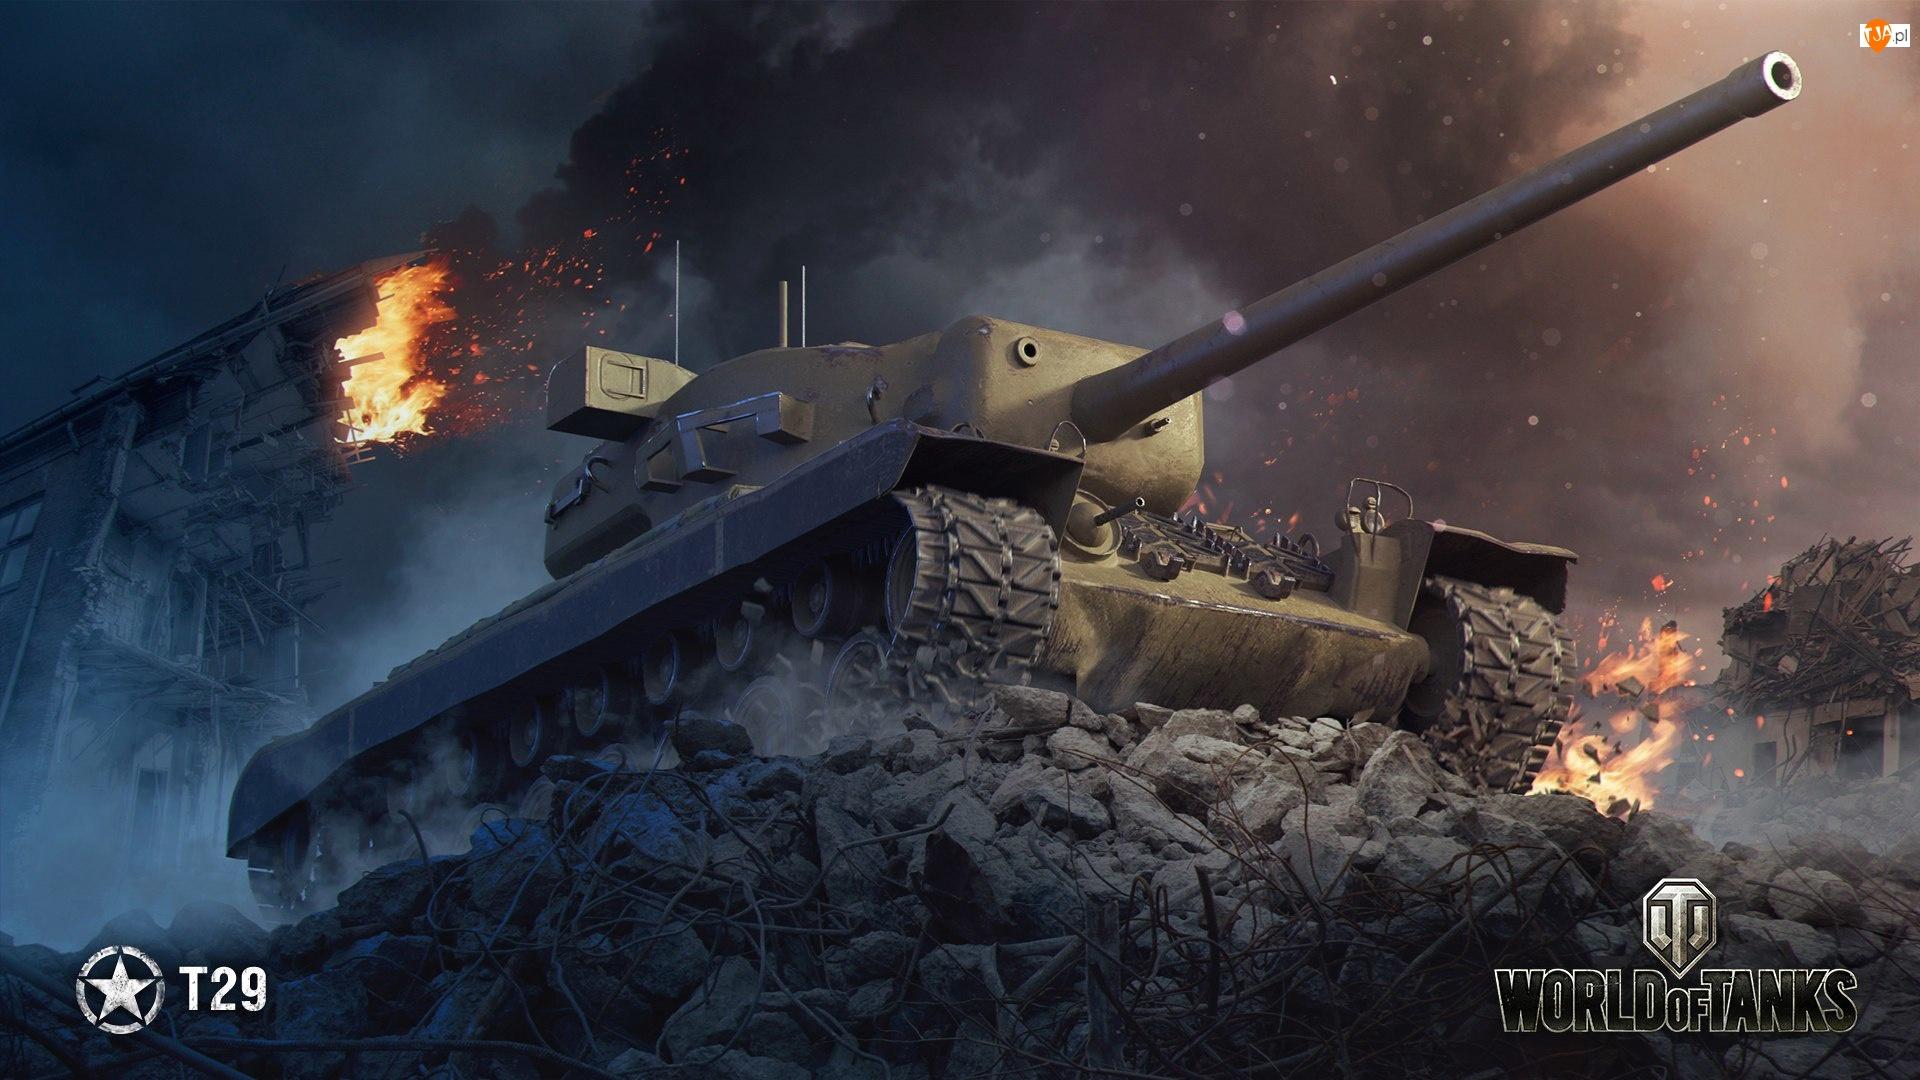 Gra, Ruiny, World of Tanks, Czołg T29